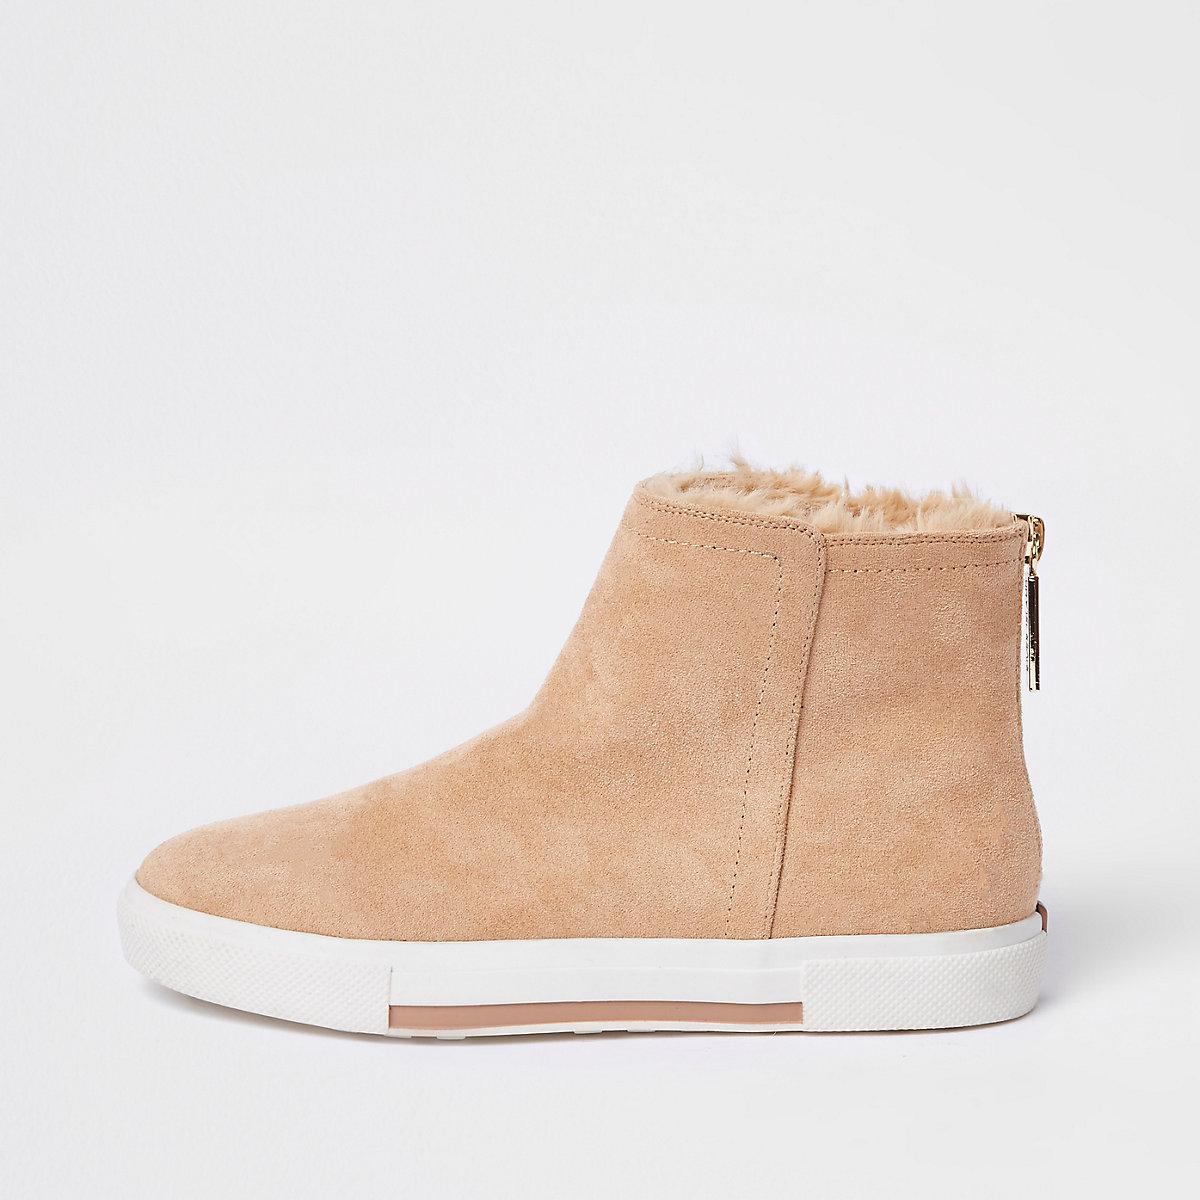 Beige faux fur lined boots